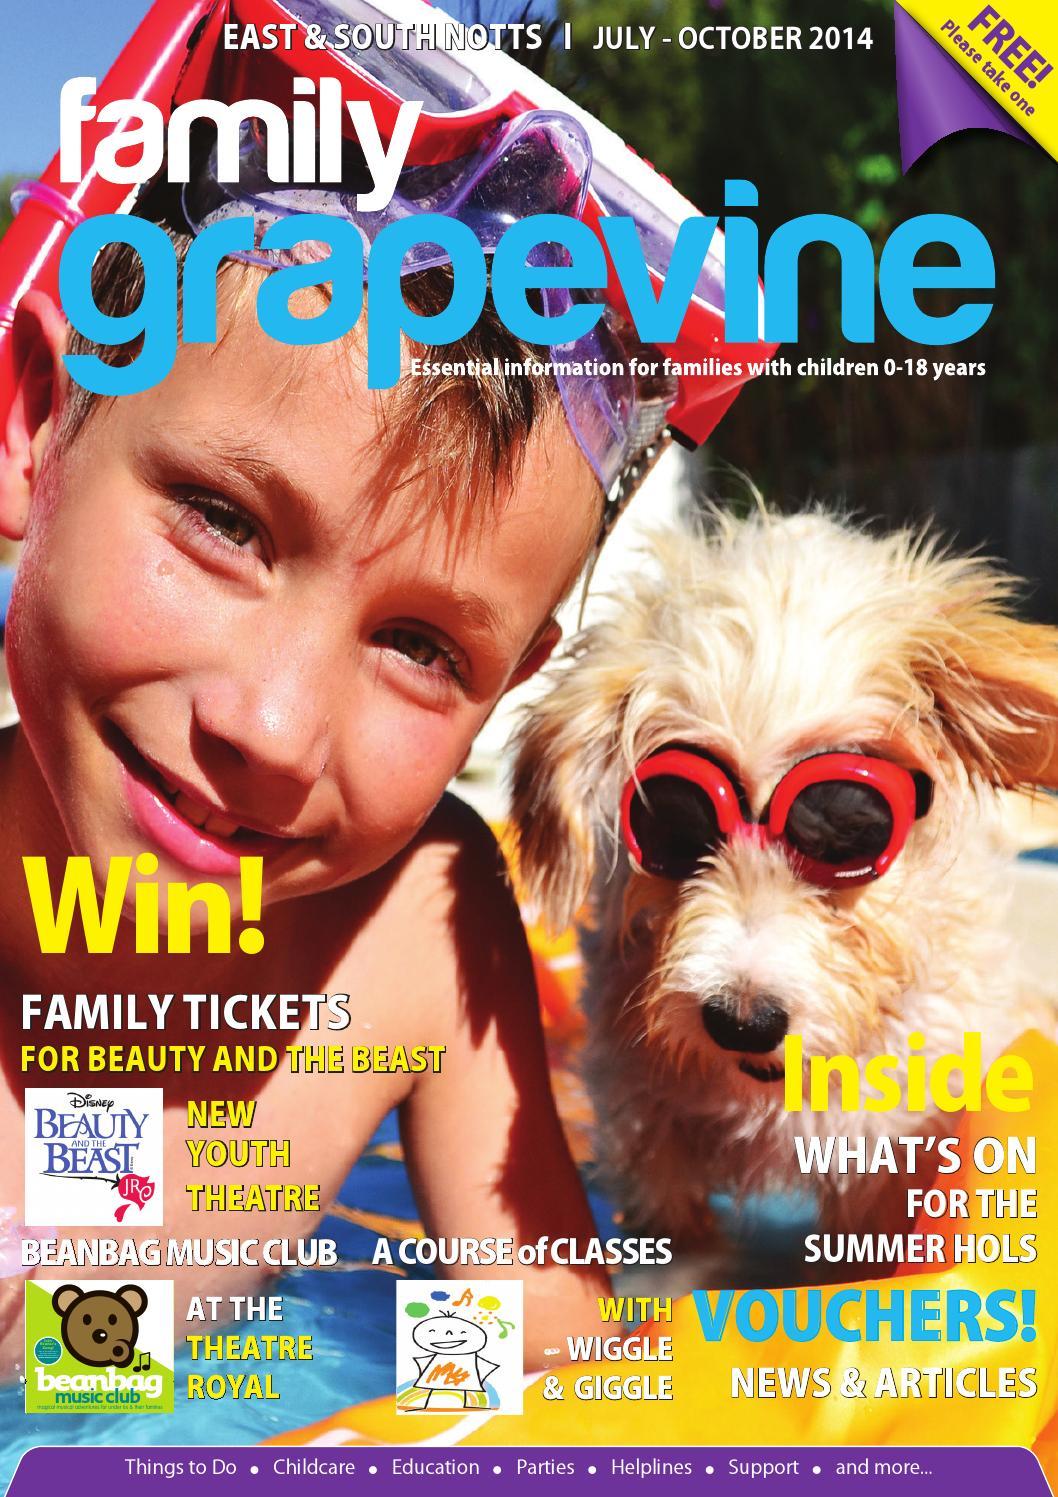 Family Grapevine East South Notts Summer 14 By Jolie Clothing Melish Dress Gold M Nottinghamshire Issuu